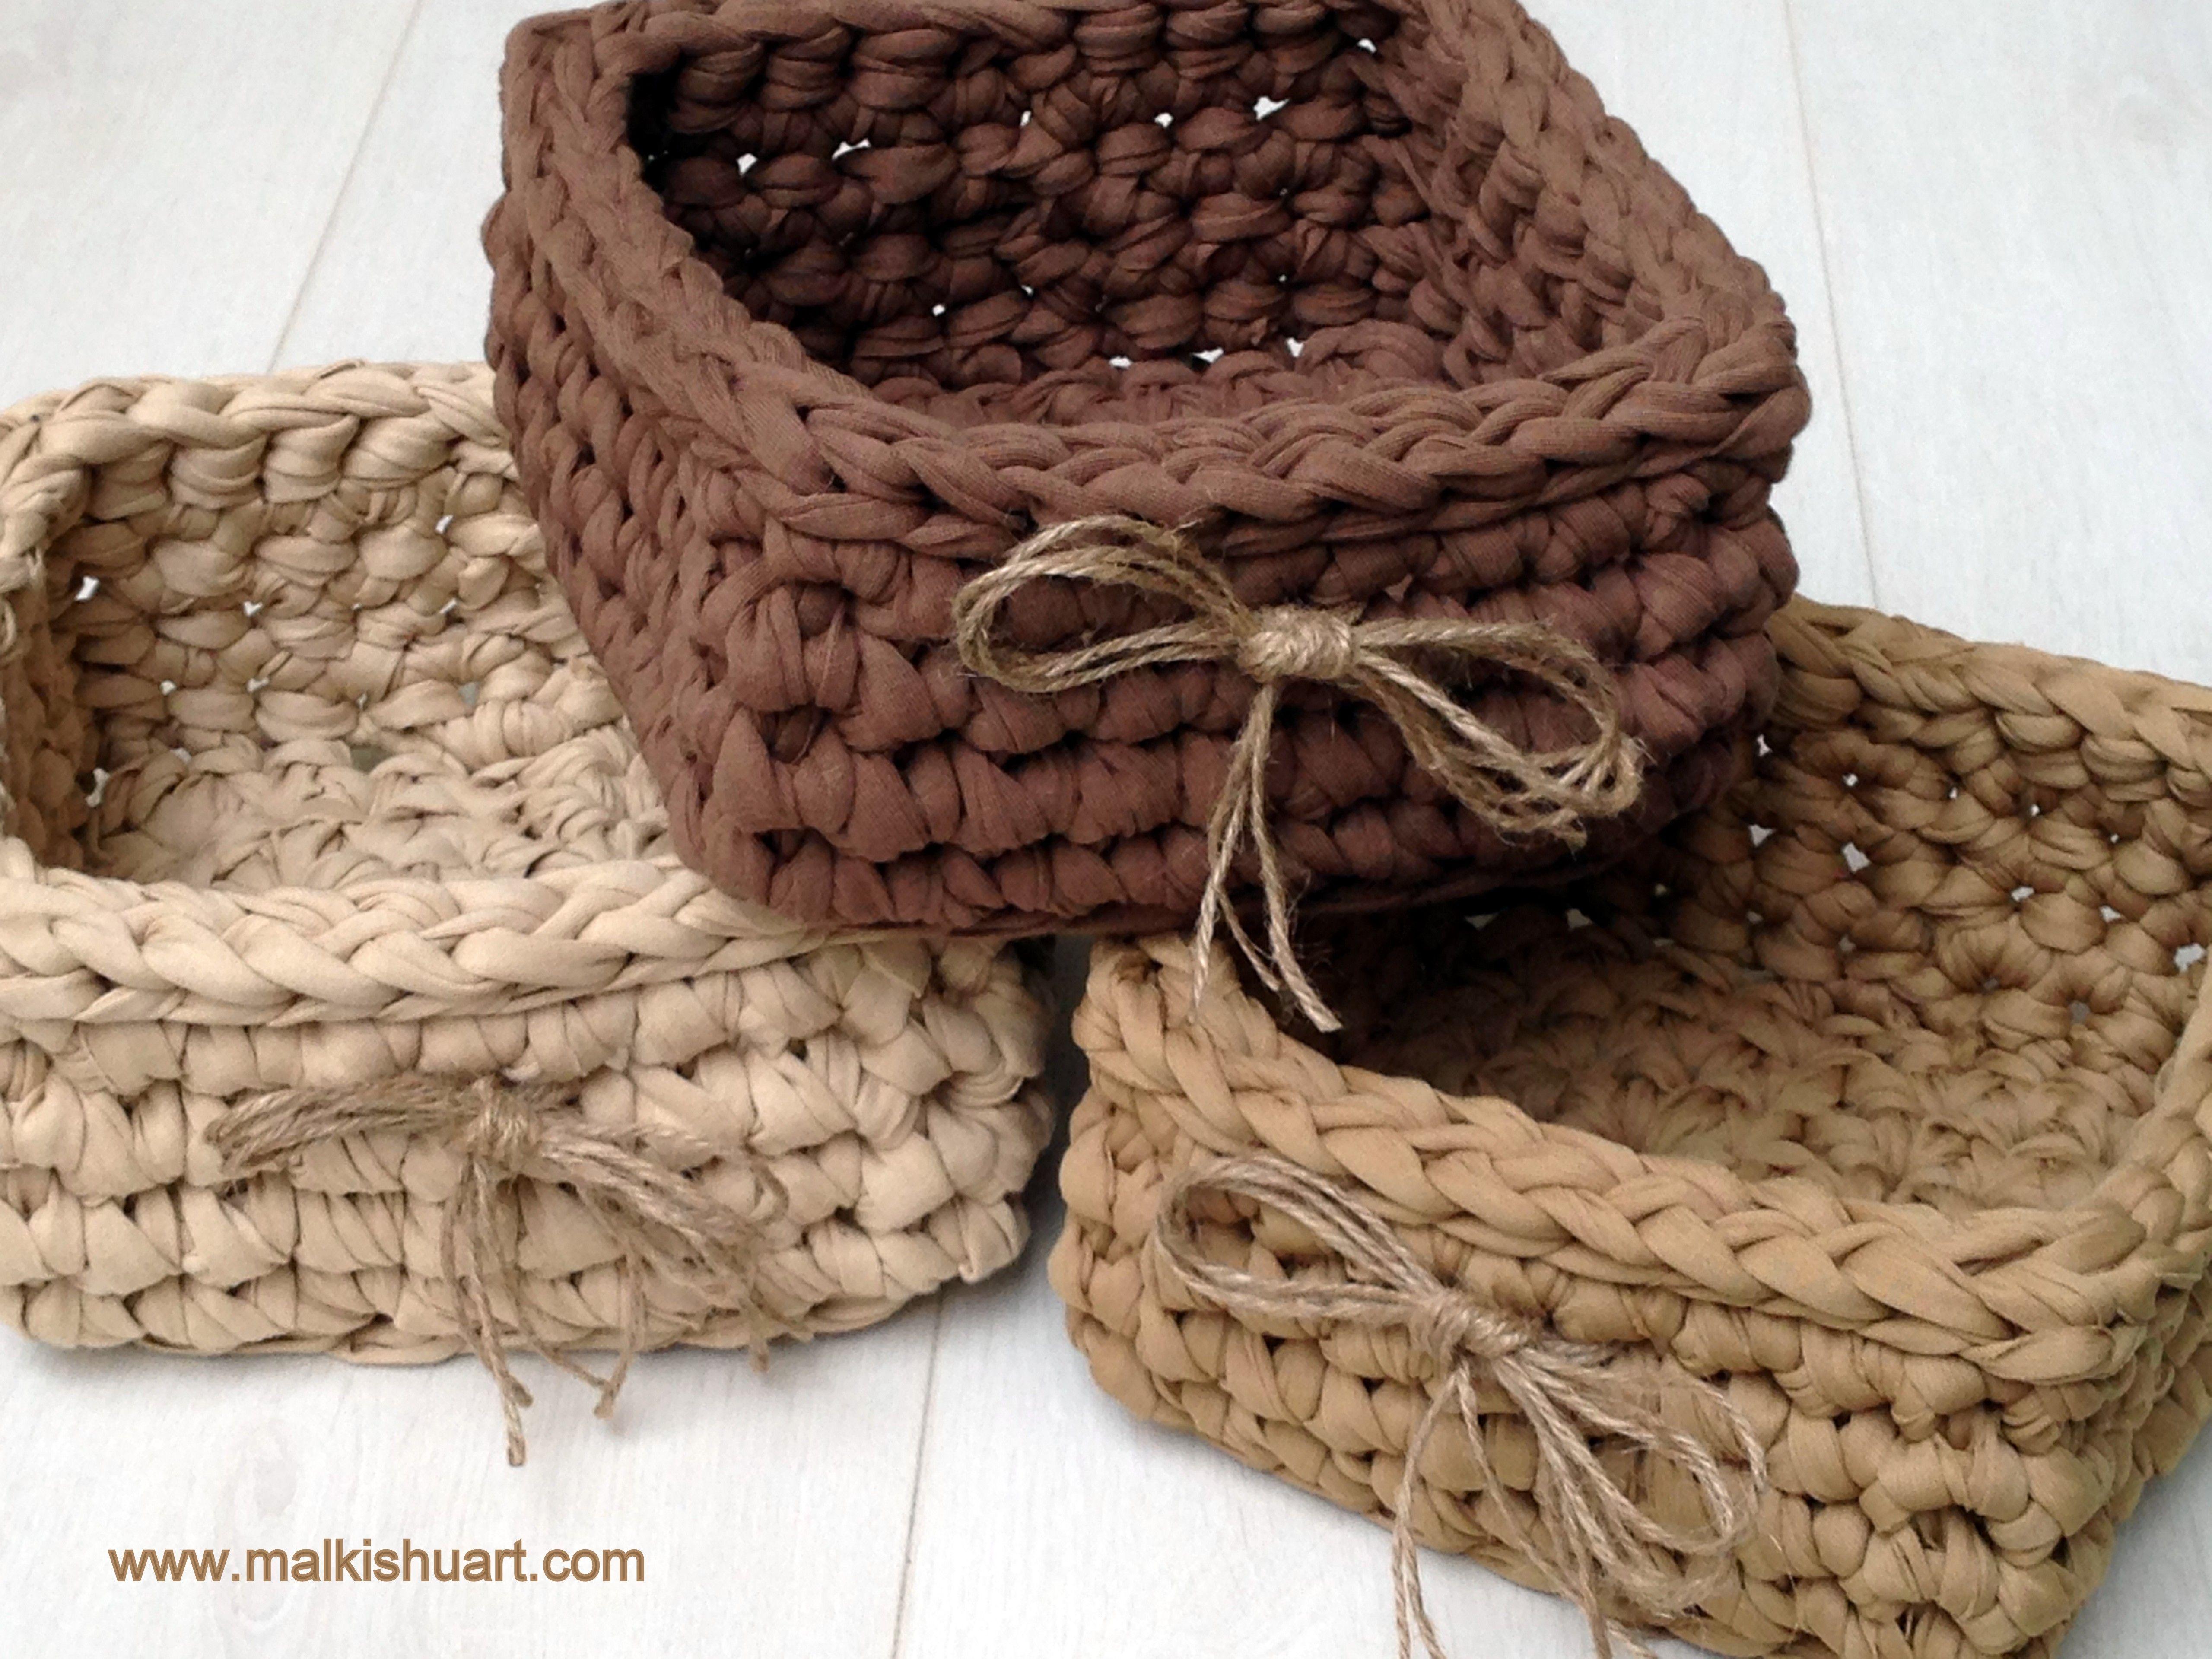 crochet t shirt yarn square basket baskets pinterest panier corbeille et crochet. Black Bedroom Furniture Sets. Home Design Ideas